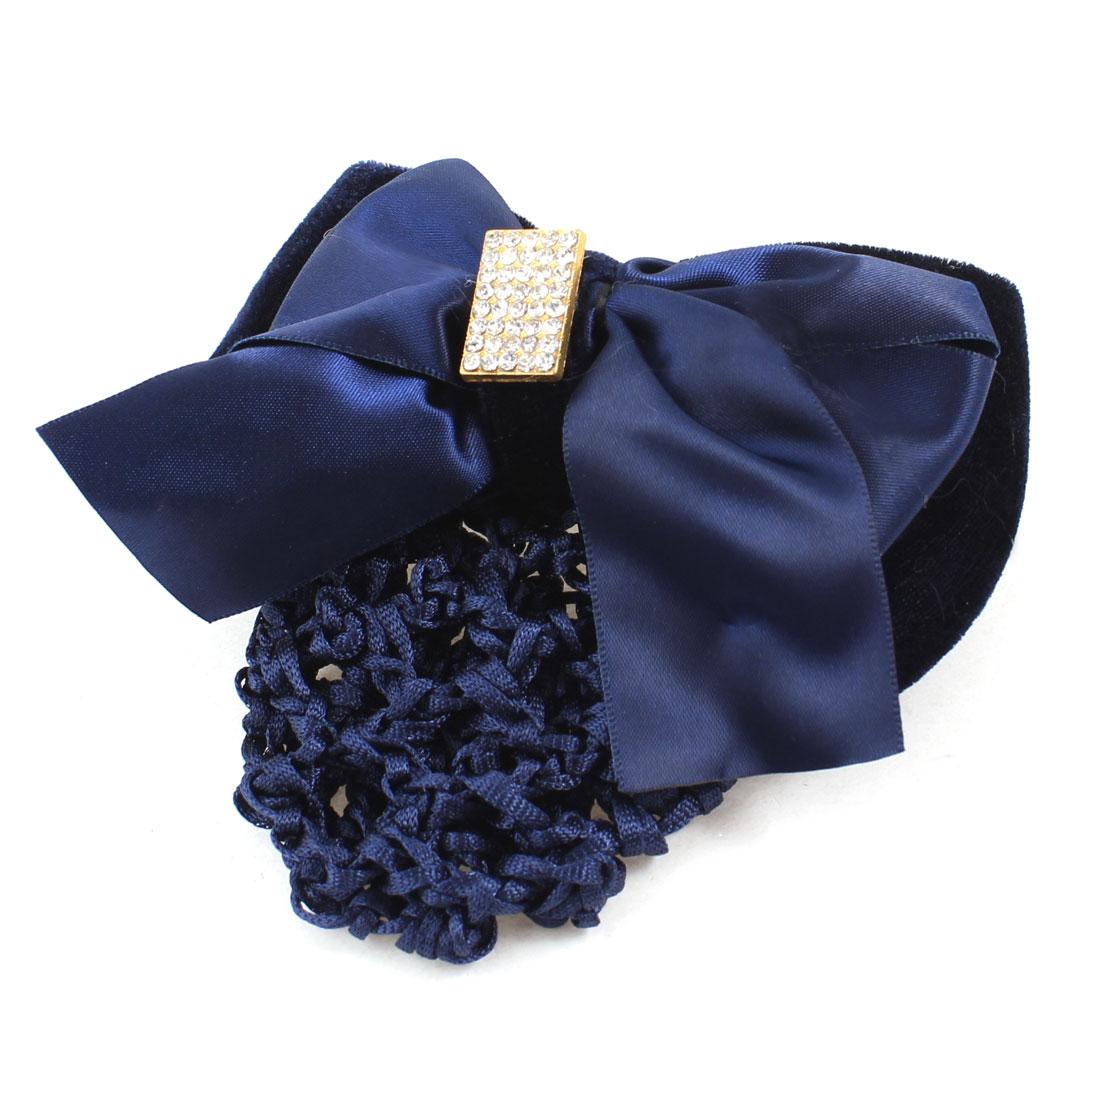 Lady Rhinestones Bowknot Barrette Nylon Snood Net French Hairclip Black Blue